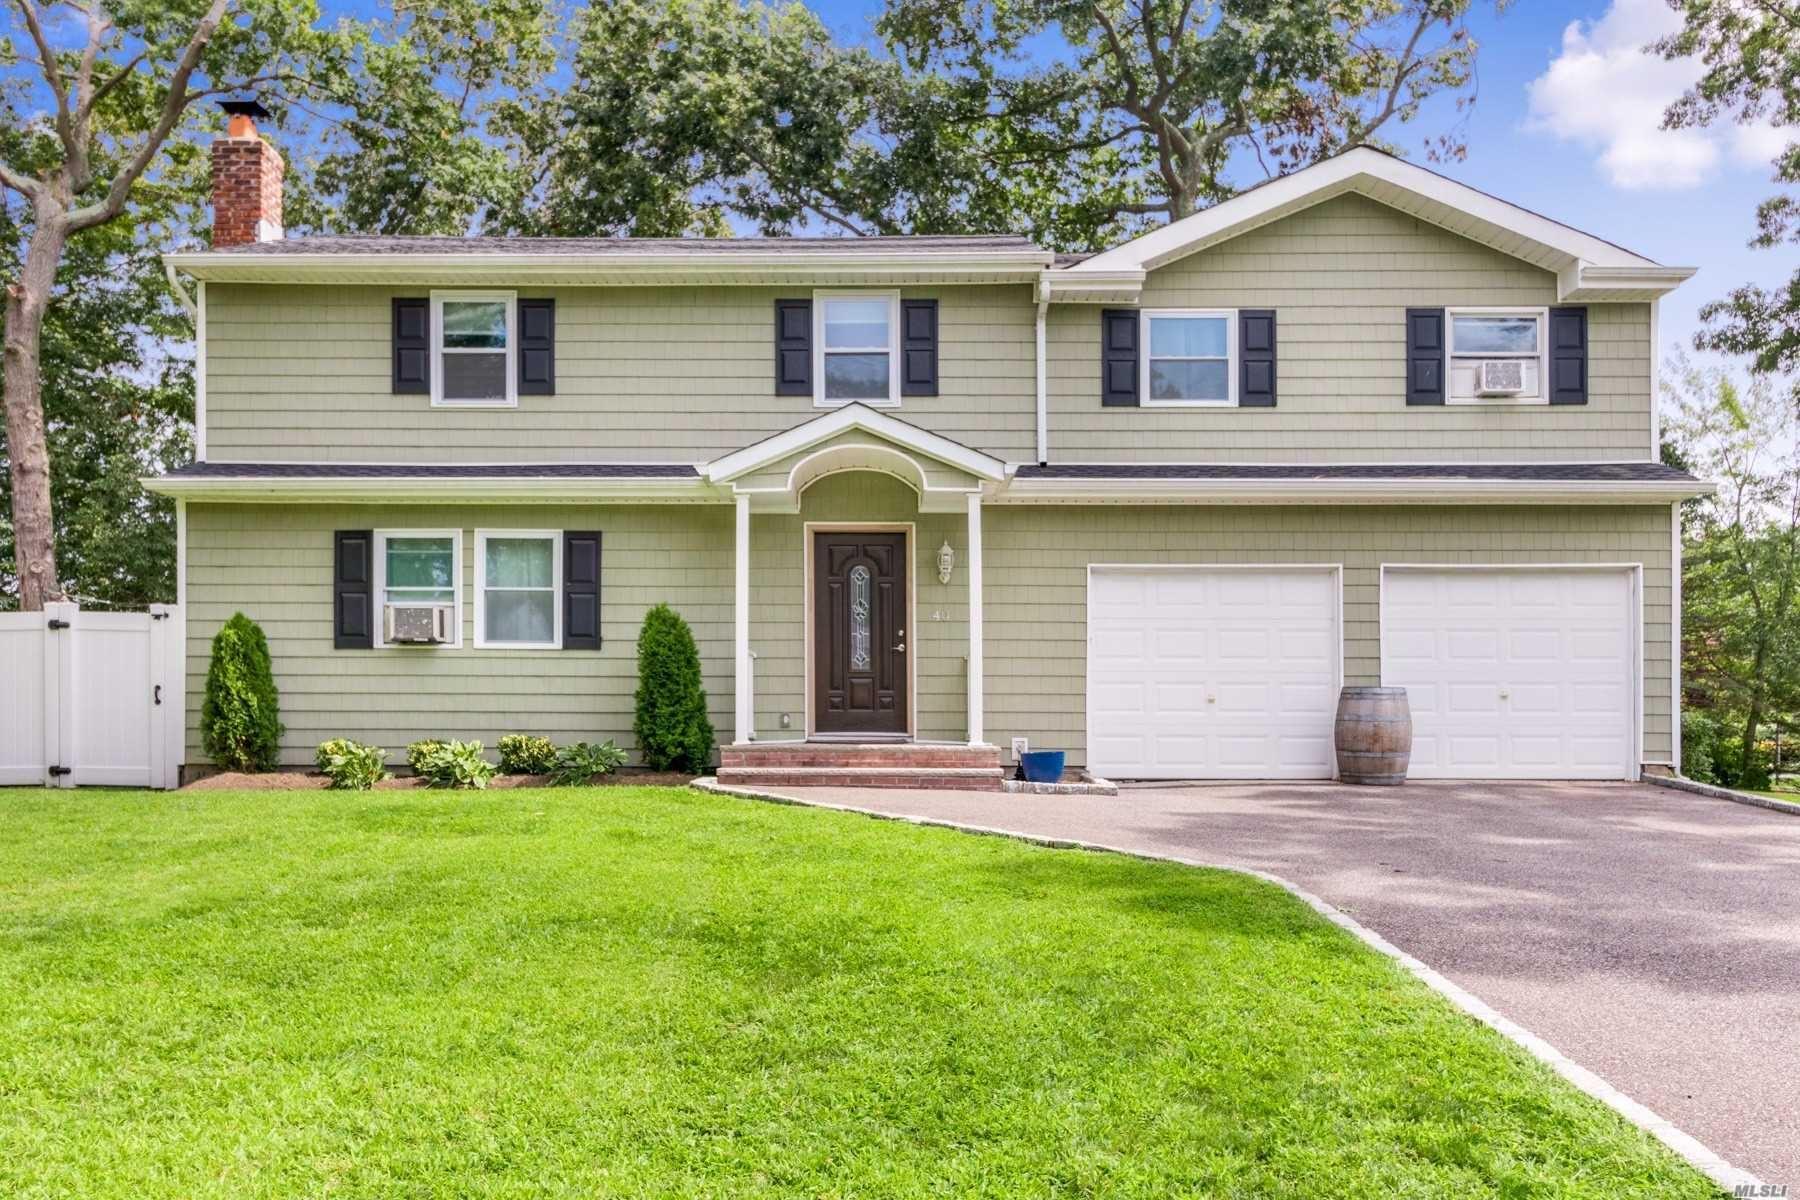 40 Ridge Haven Drive, Ridge, NY 11961 - MLS#: 3245436